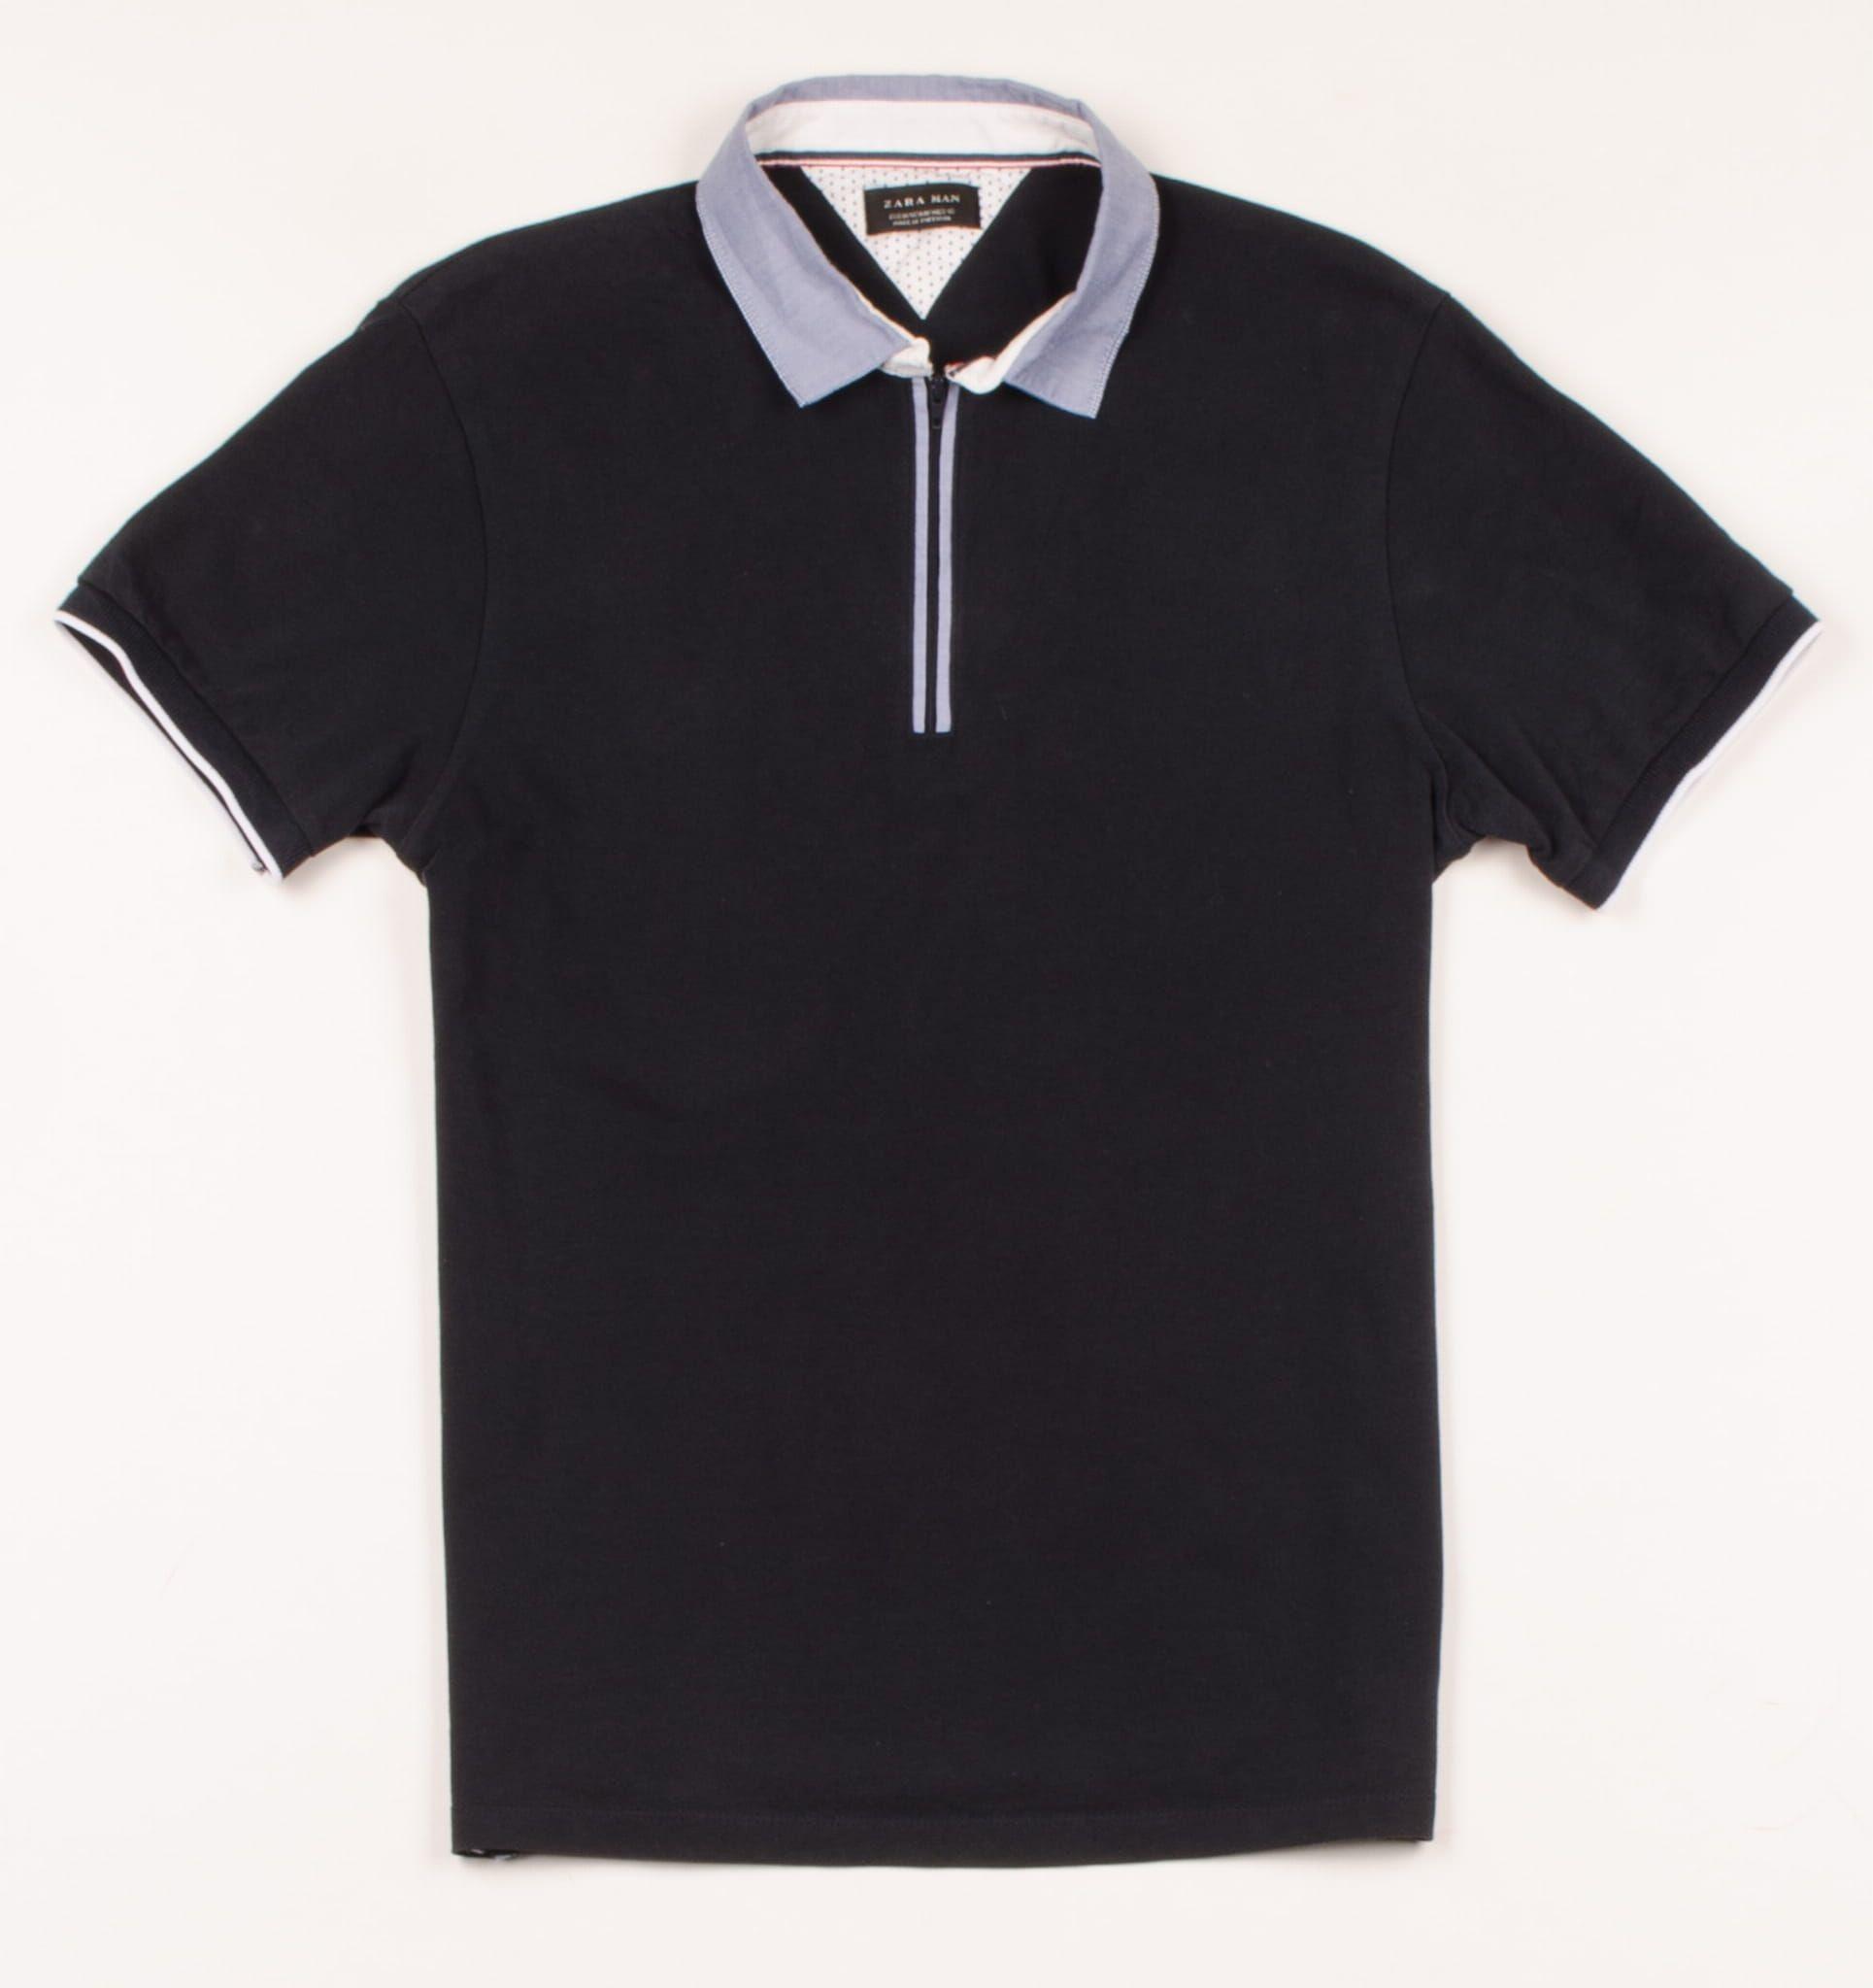 31189 Zara Koszulka Polo Męska M